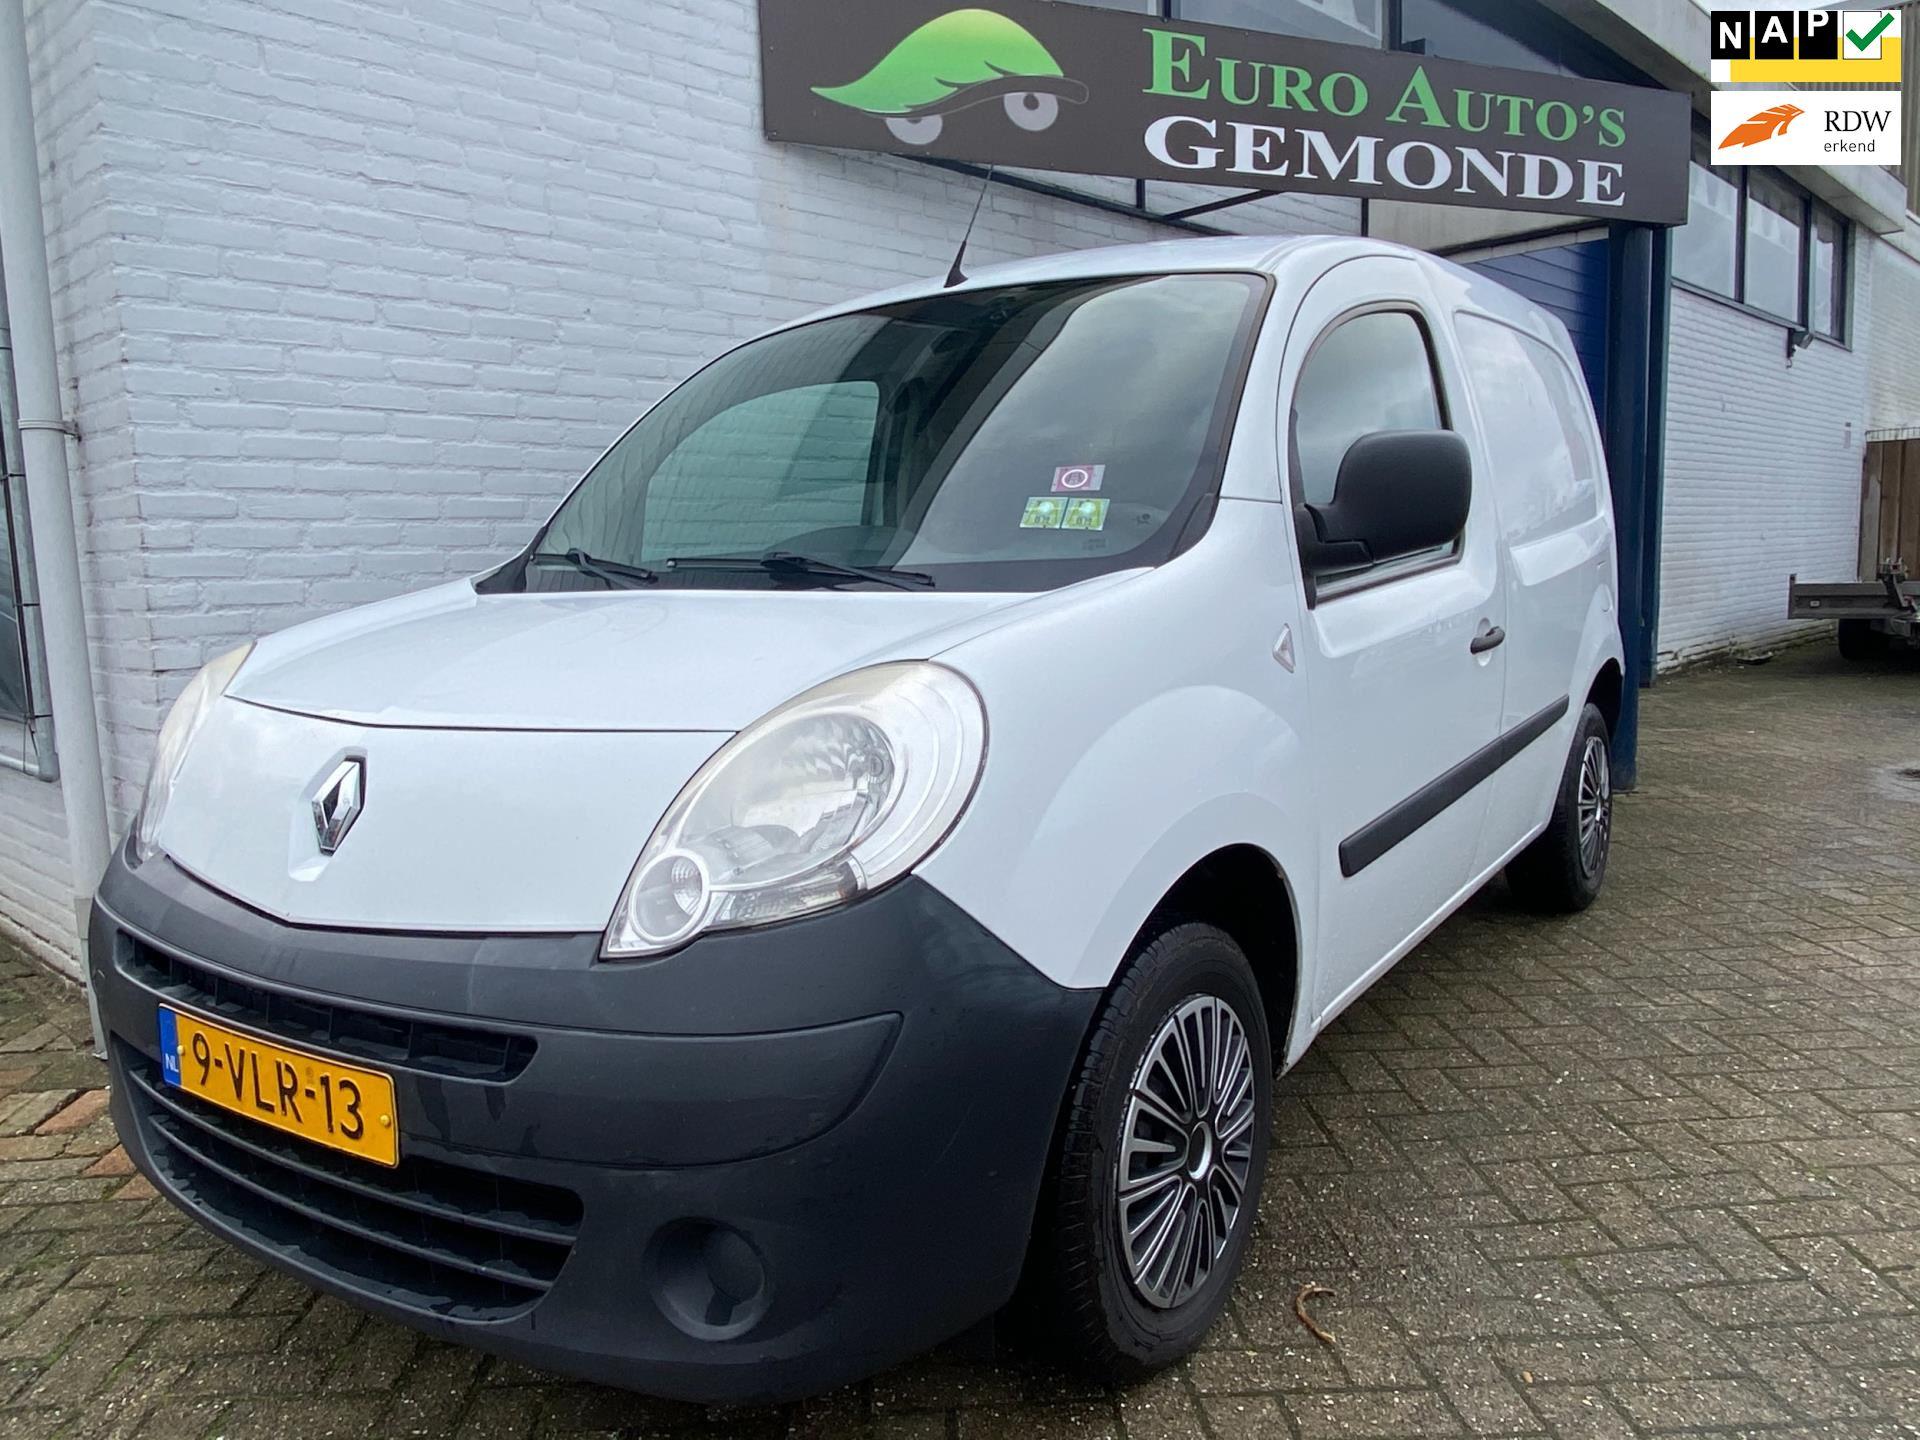 Renault Kangoo Express occasion - Euro Auto's Gemonde